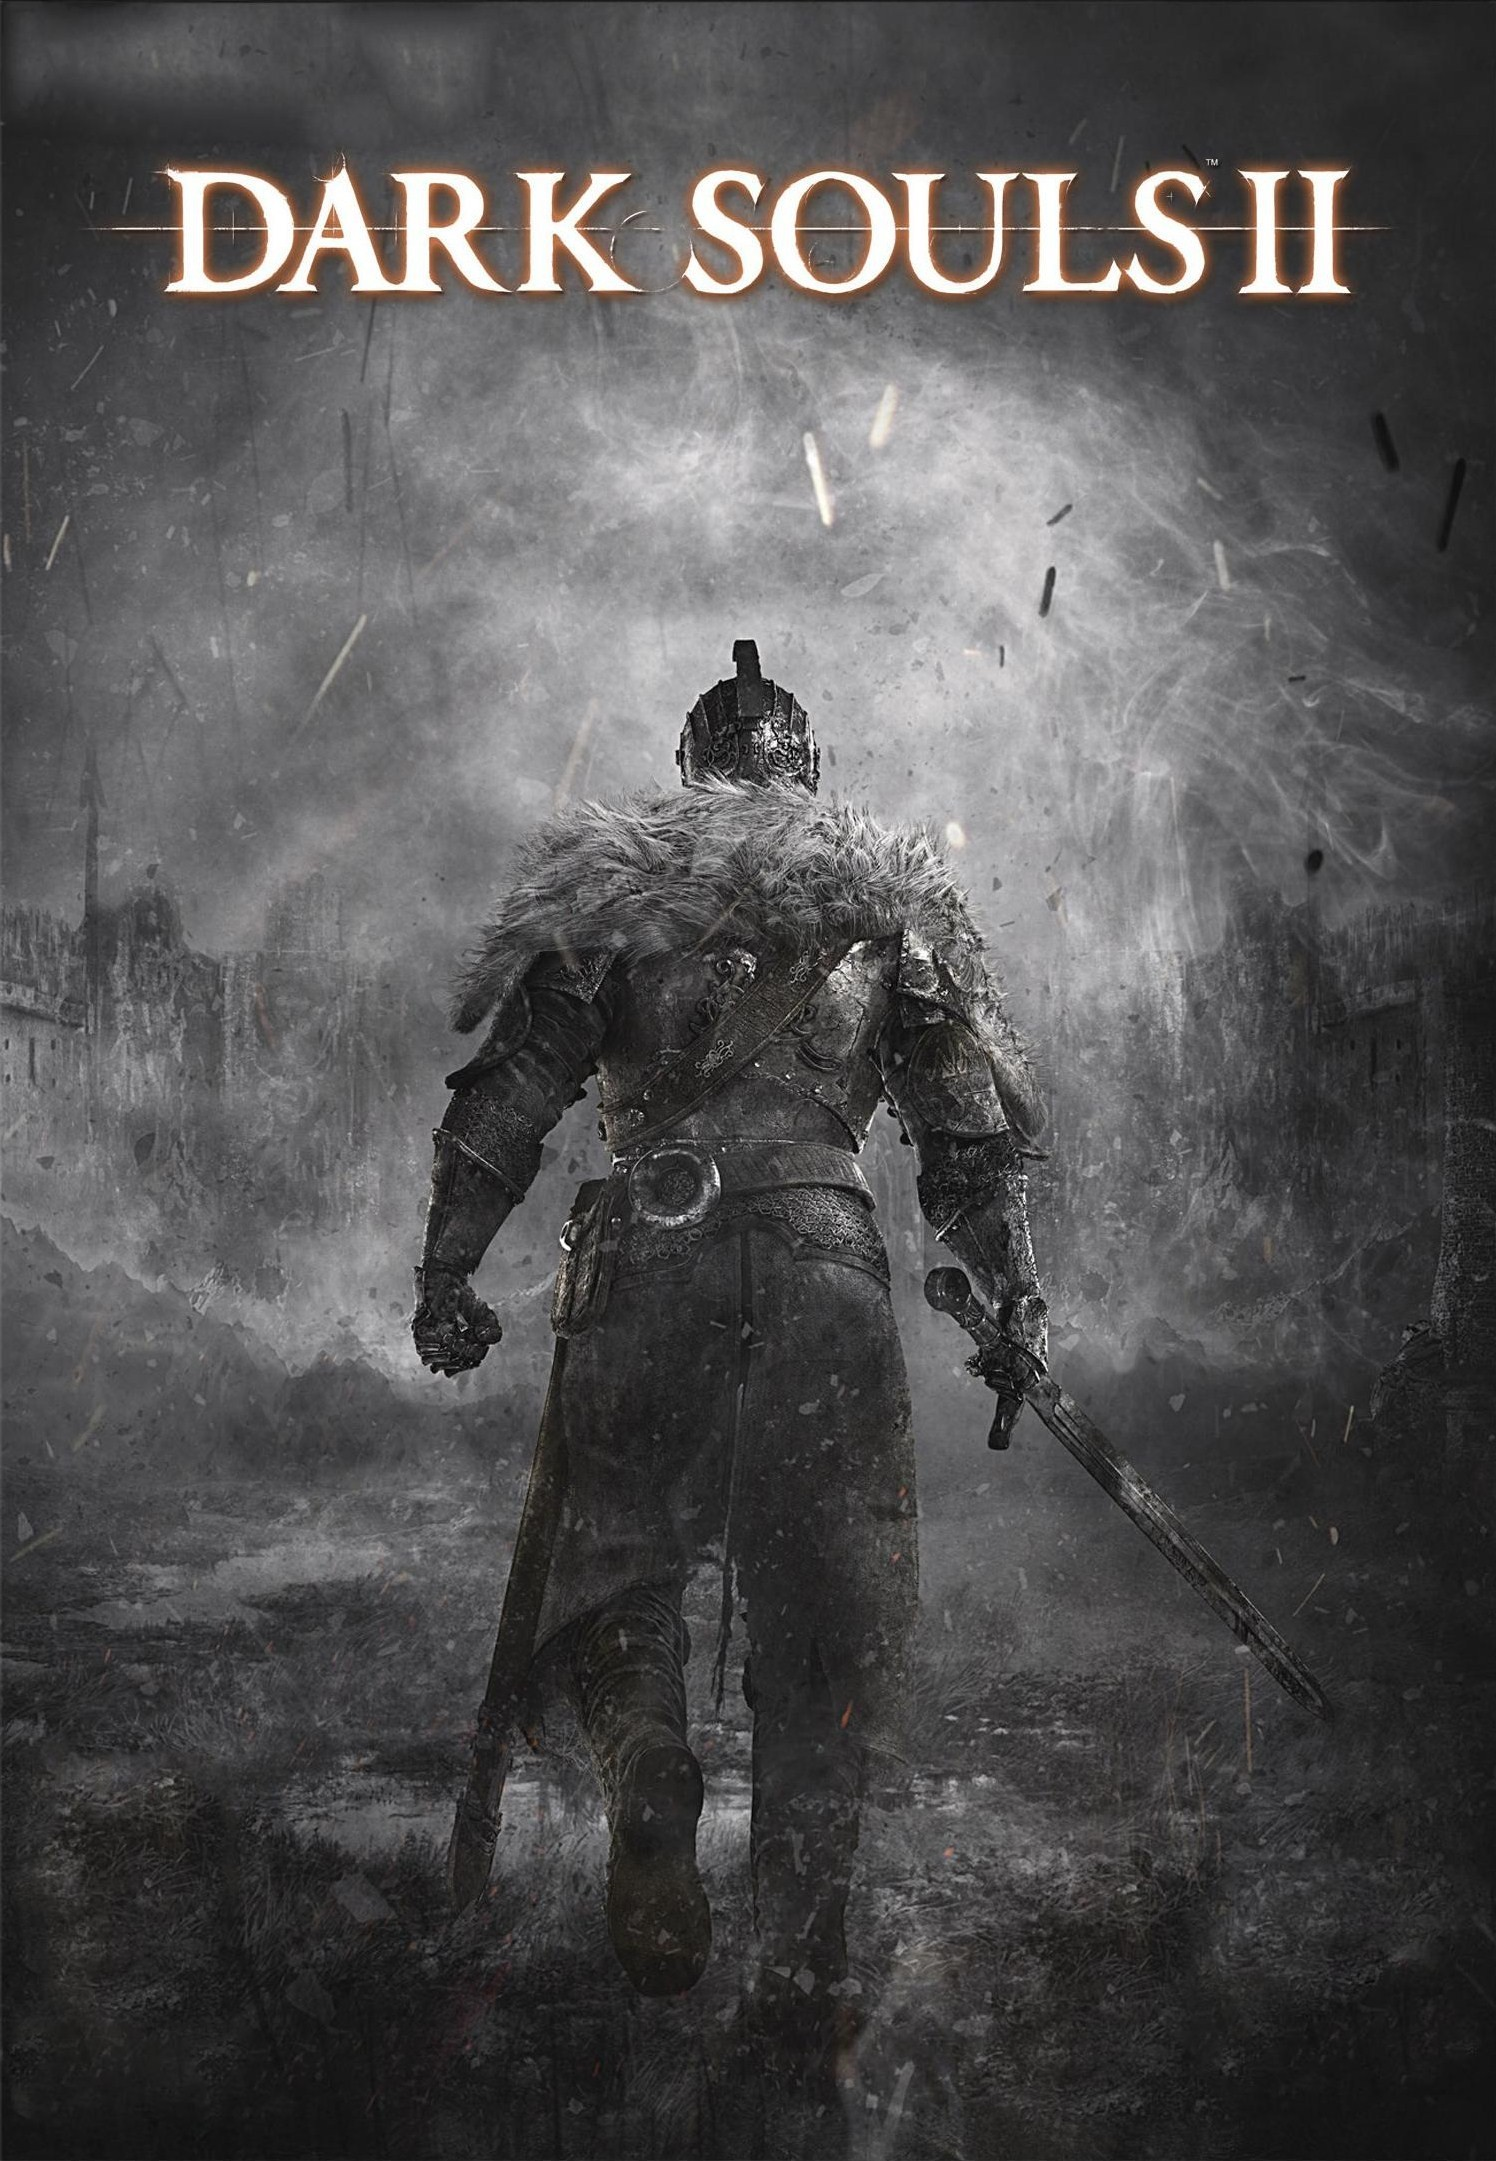 Dark Souls Wallpapers : 20 Best Dark Souls 2 & Dark Souls 3 Wallpapers HD  2016 : Dark Souls Wallpapers : Dark Souls a sequel to the breakout hit Dark  Souls, …